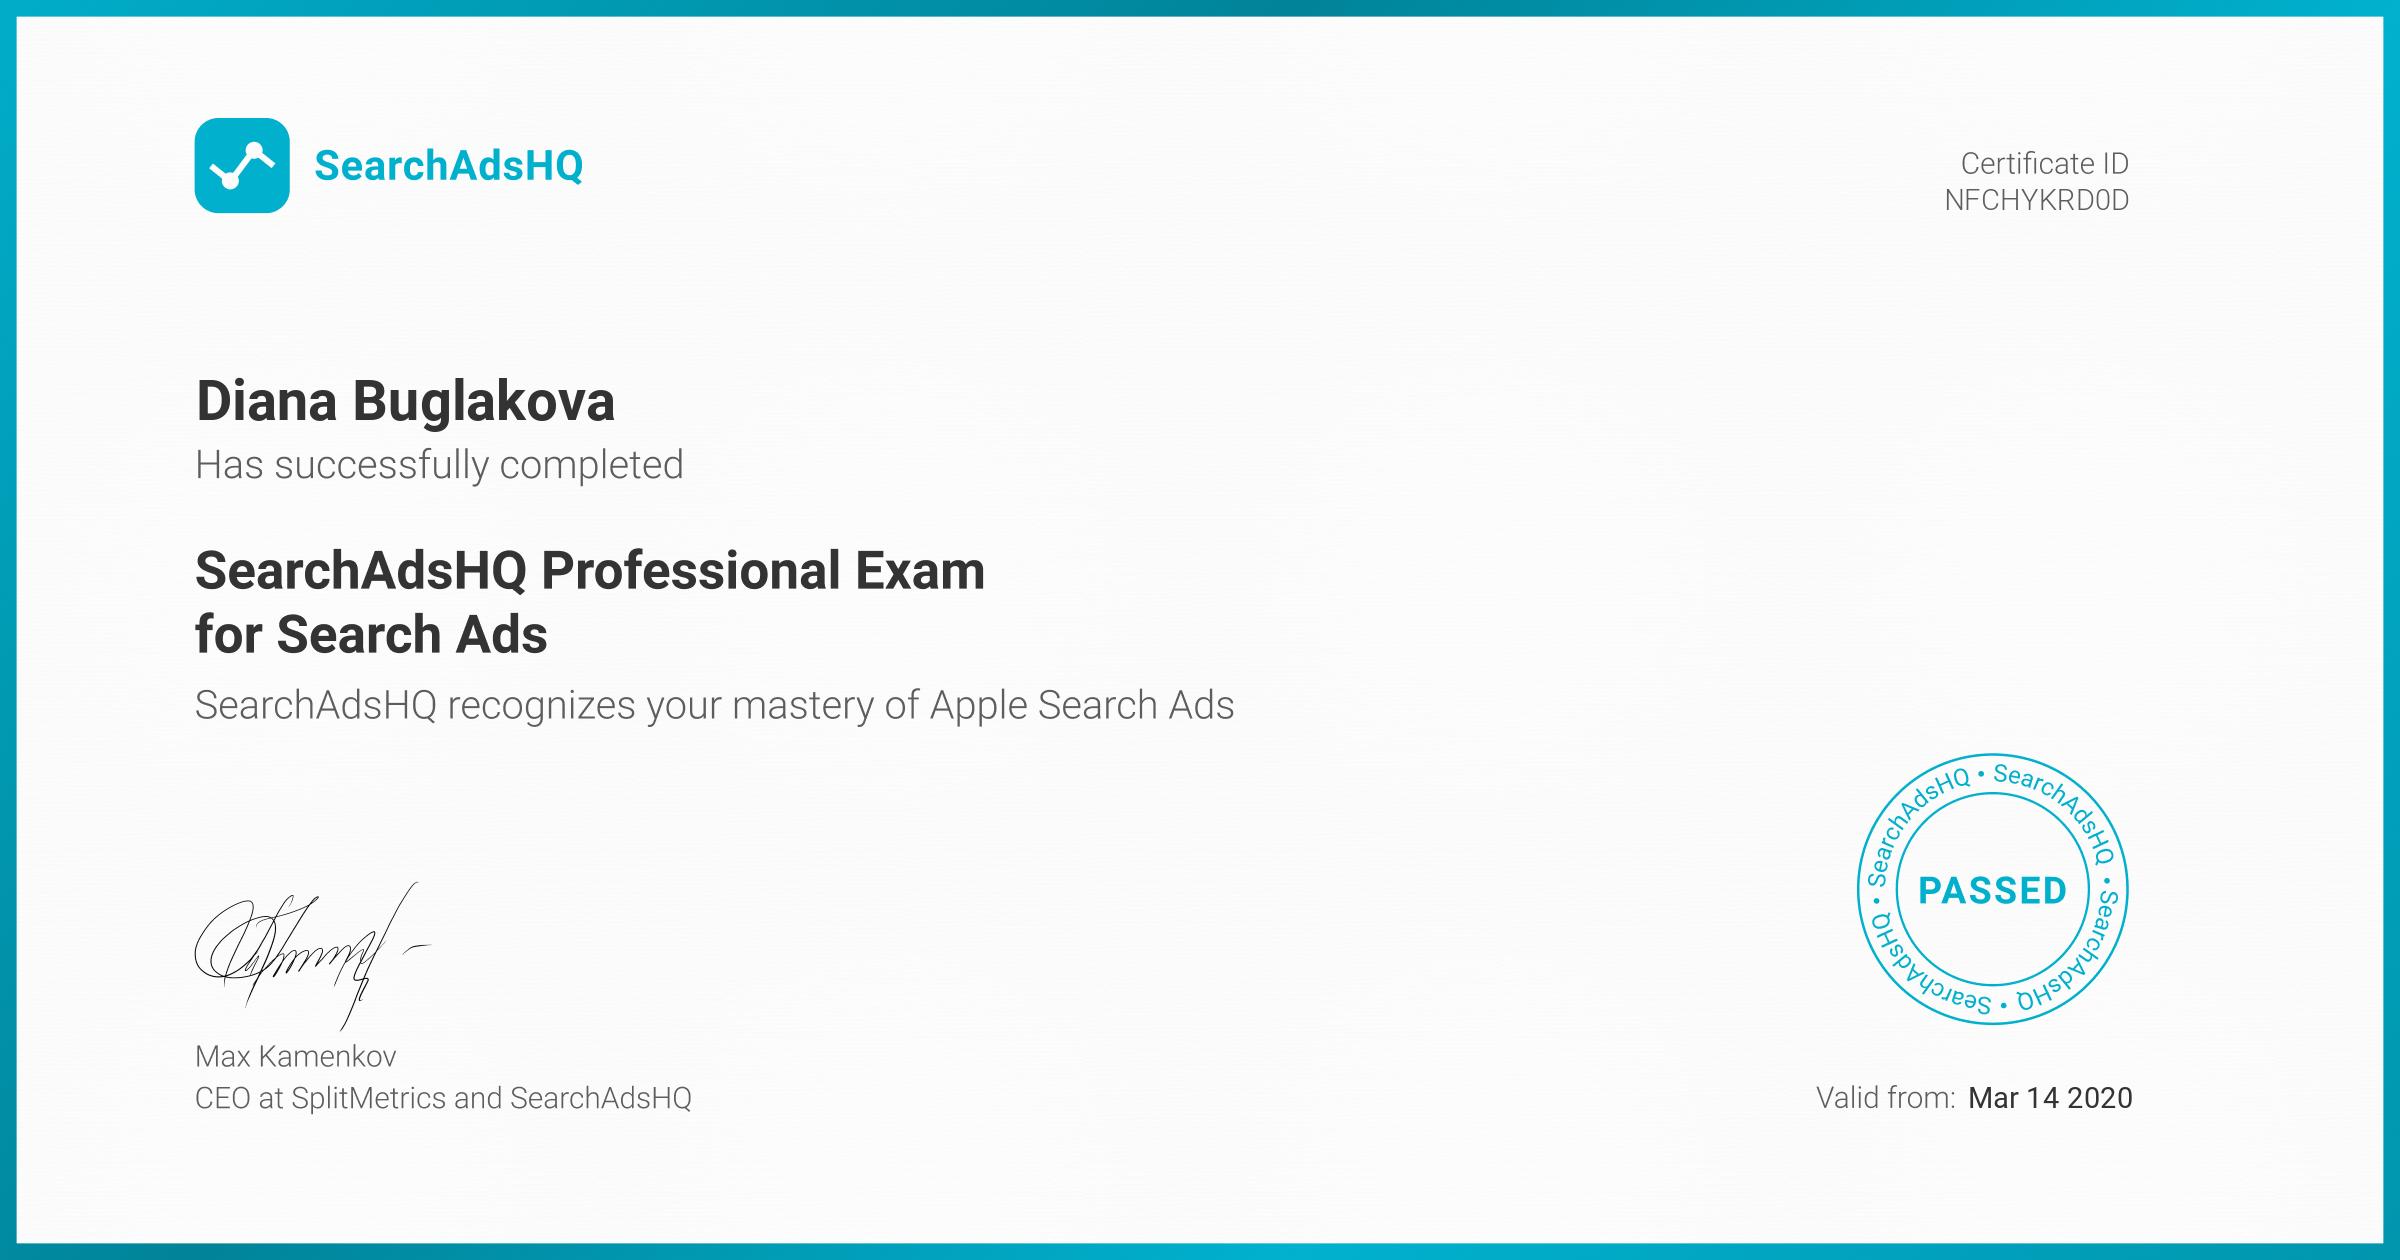 Certificate for Diana Buglakova | SearchAdsHQ Professional Exam for Search Ads